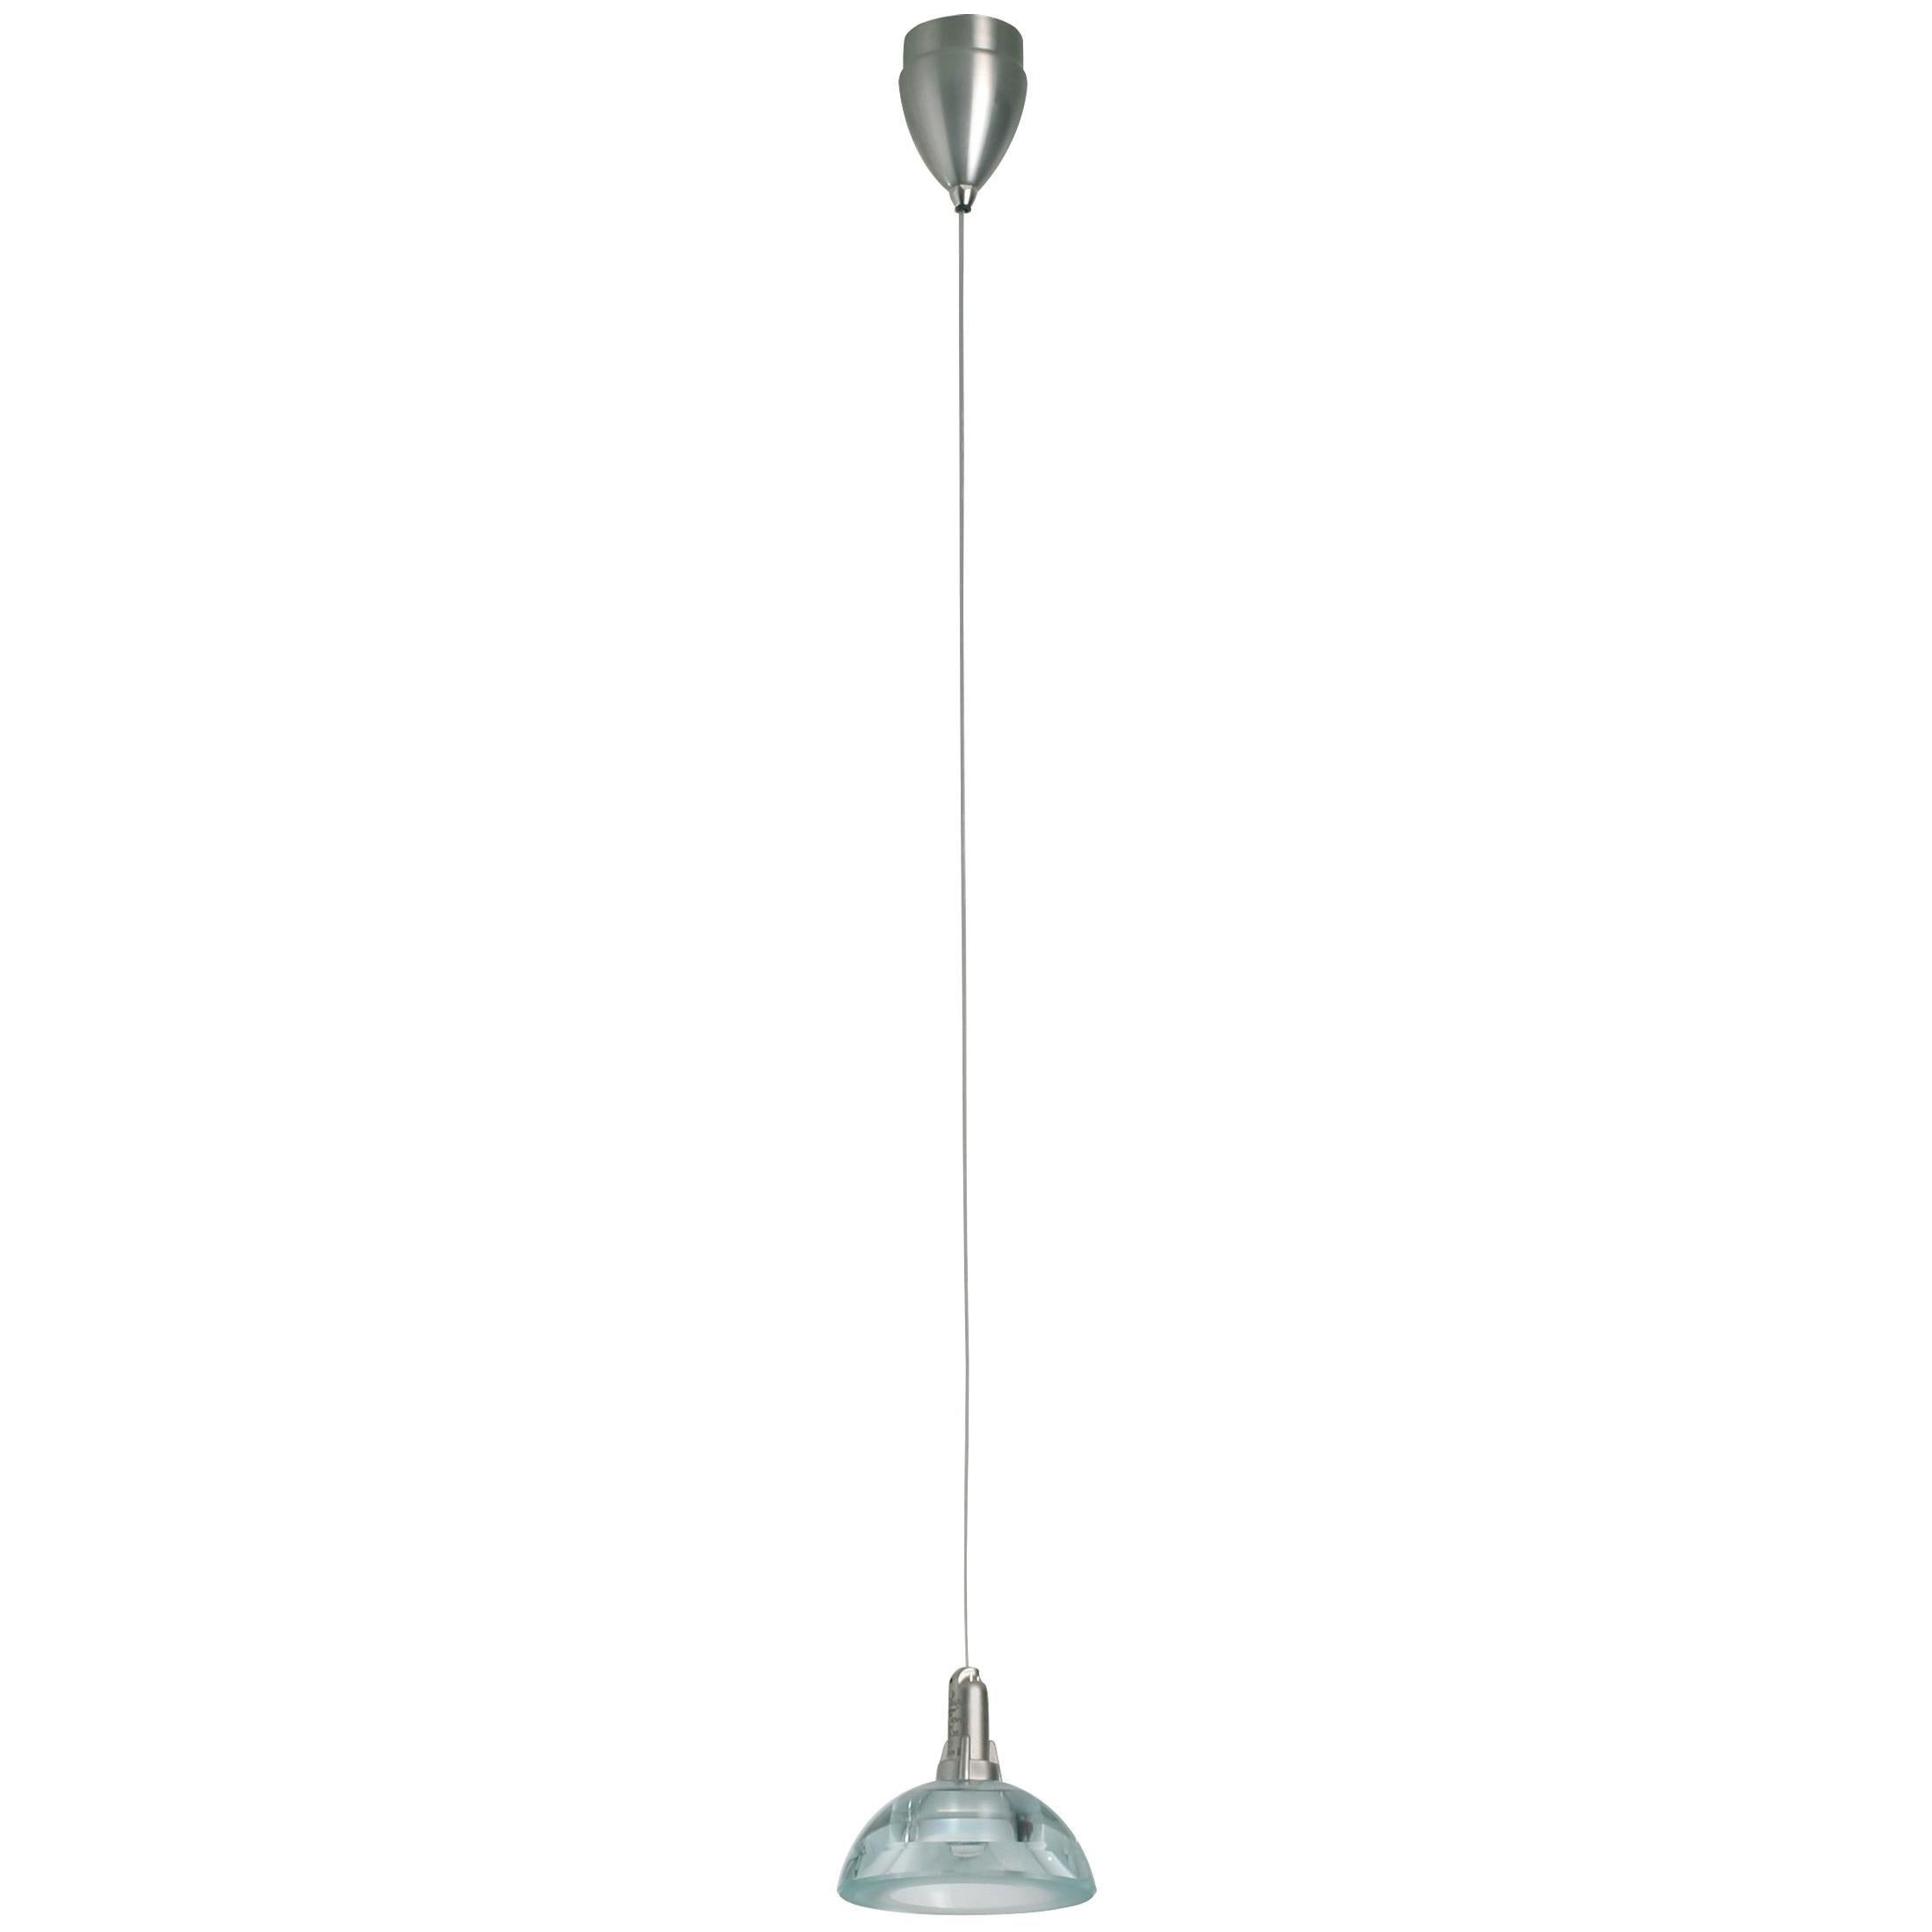 Lumina Galileo Mini Suspension Lamp by Emanuele Ricci